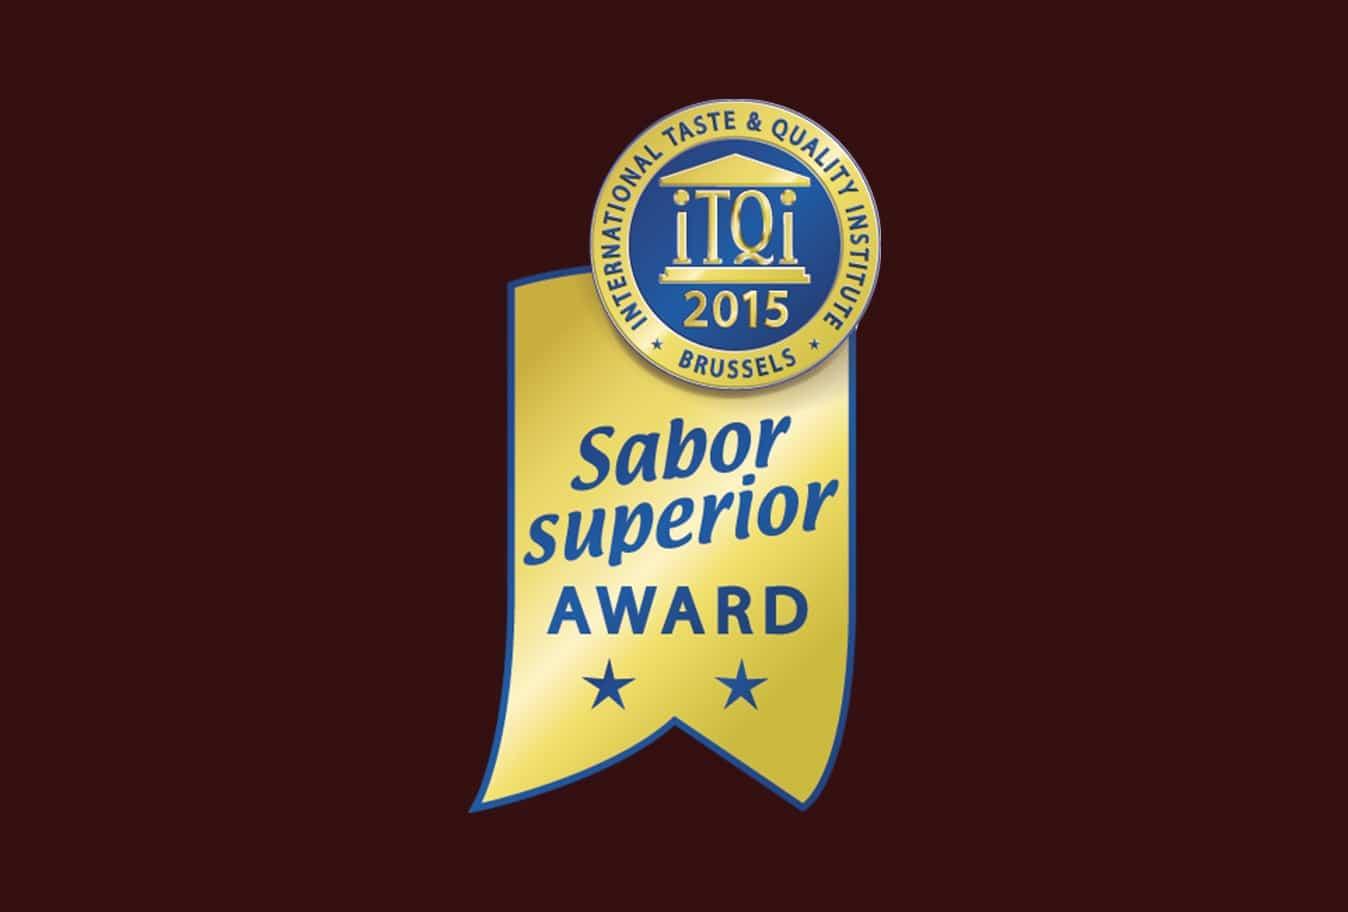 Selo Sabor Superior Award - Taste & Quality Institute